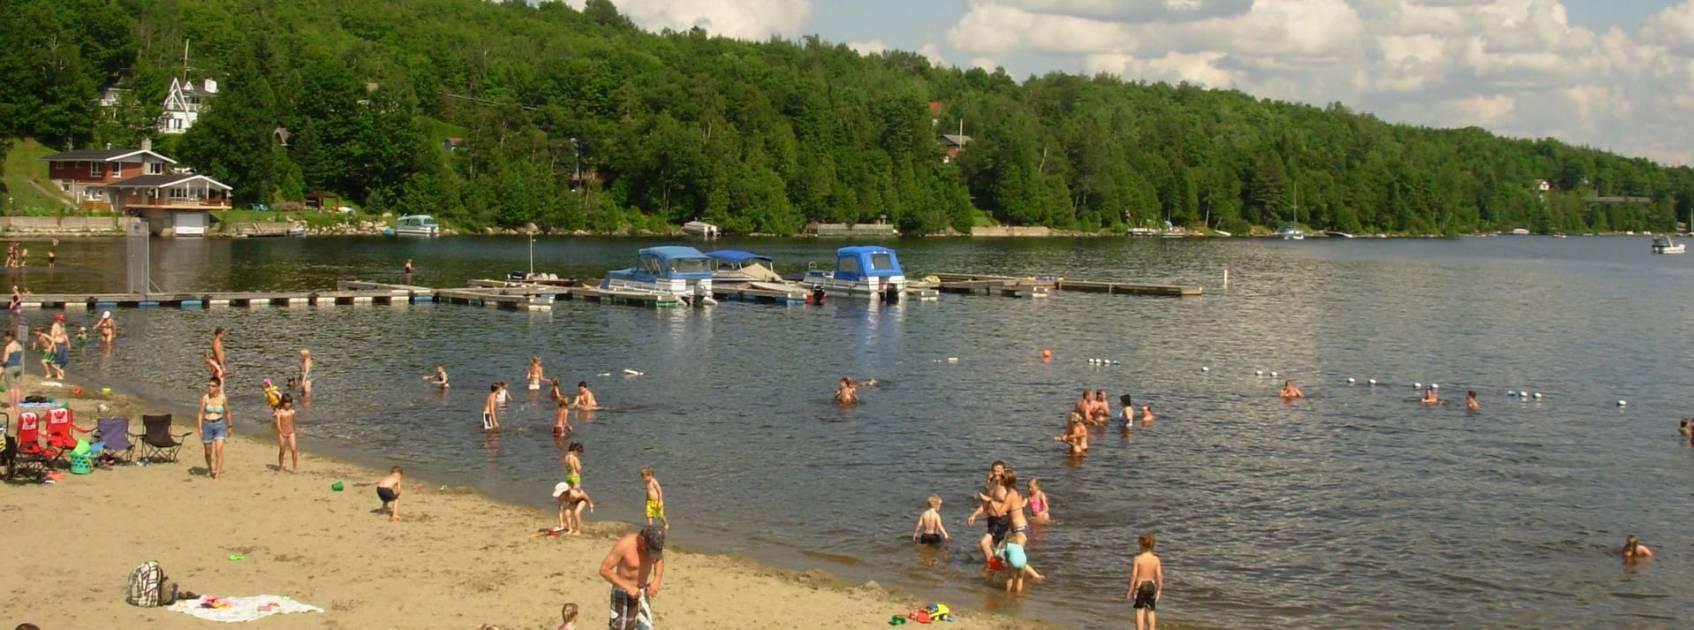 Camping Québec souligne l'investissement de ses Bâtisseurs !